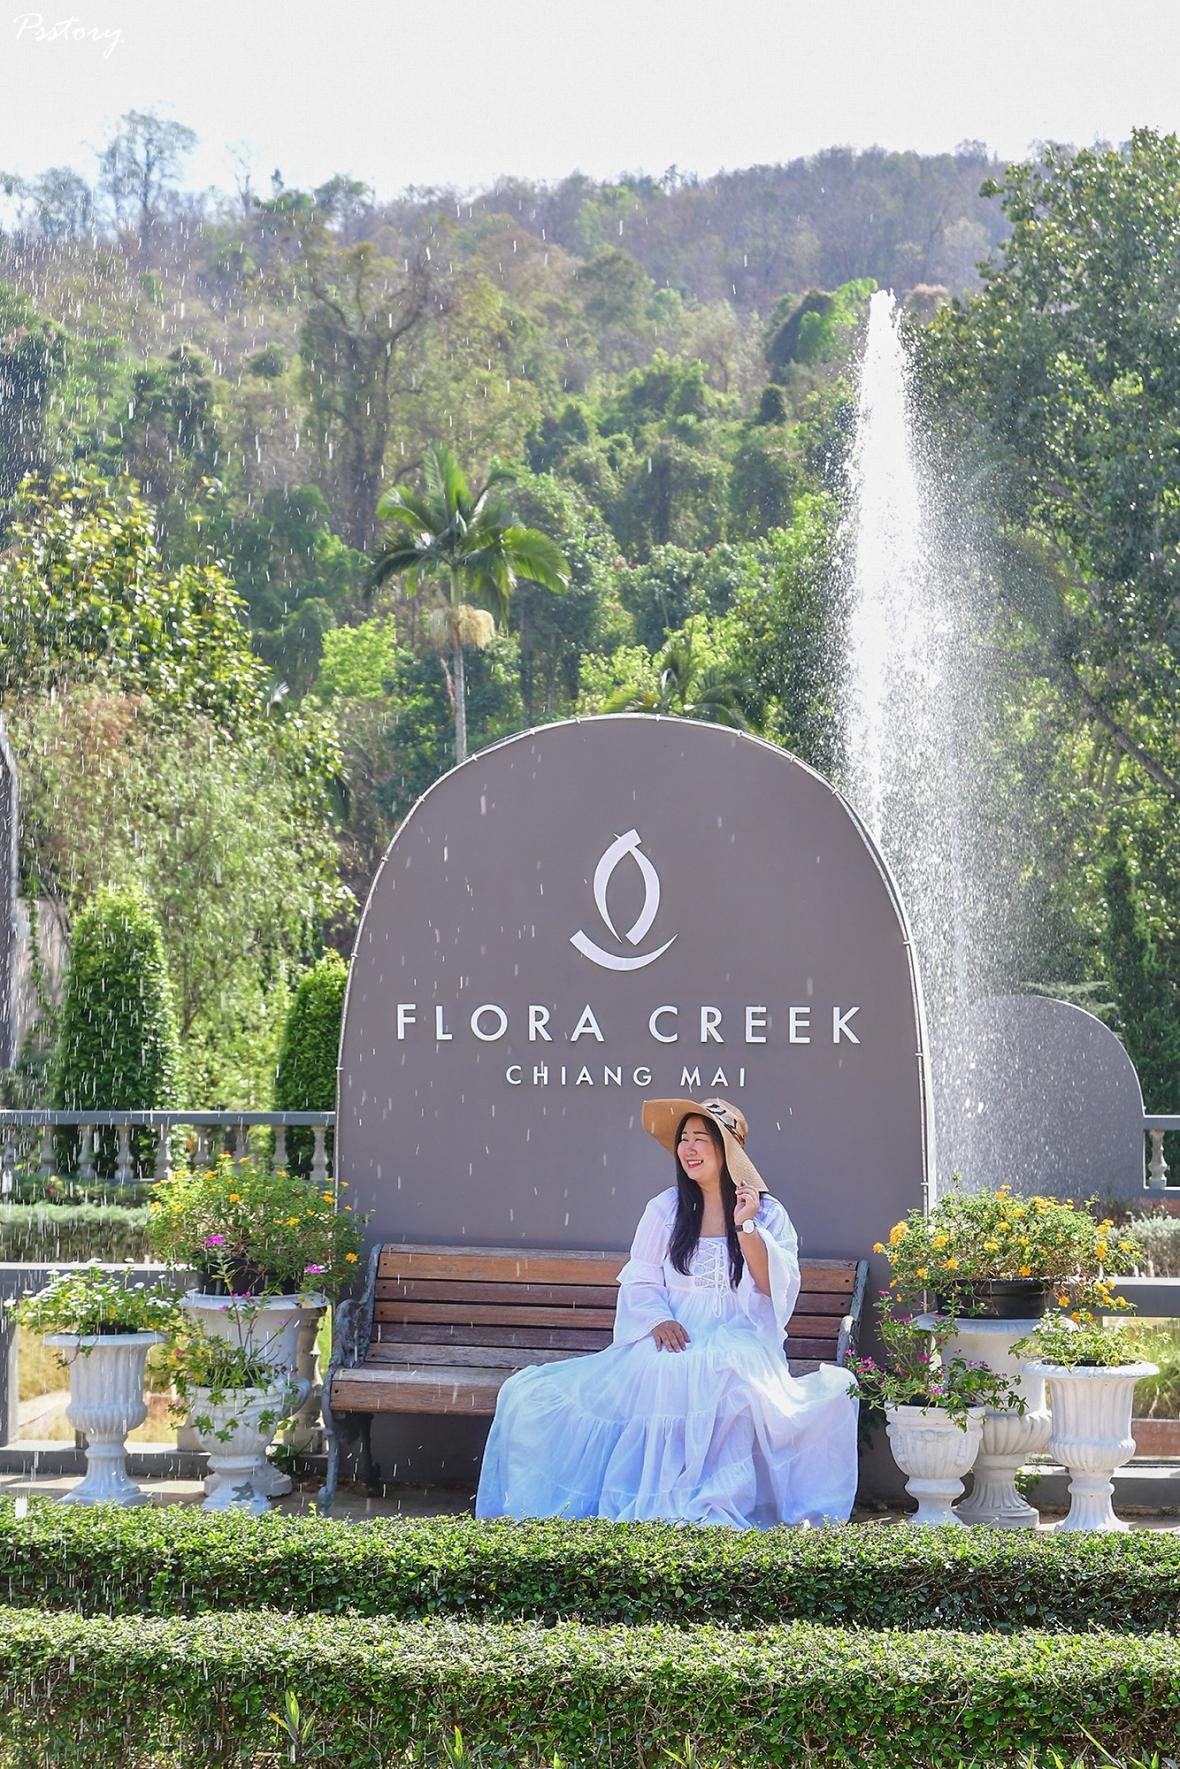 Flora Creek Chiang Mai (208)